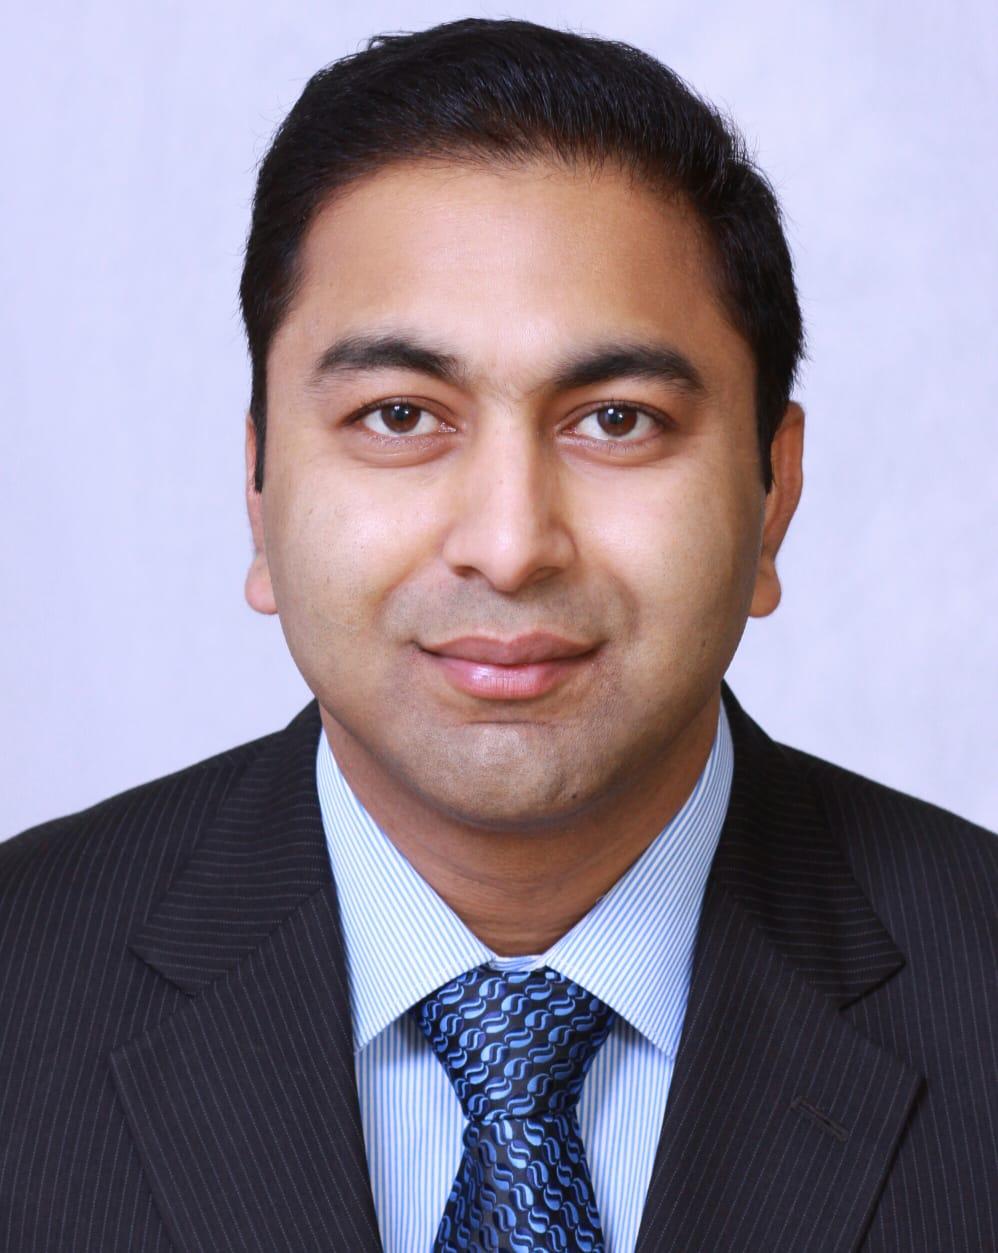 Dr. Arendra Kumar Patel